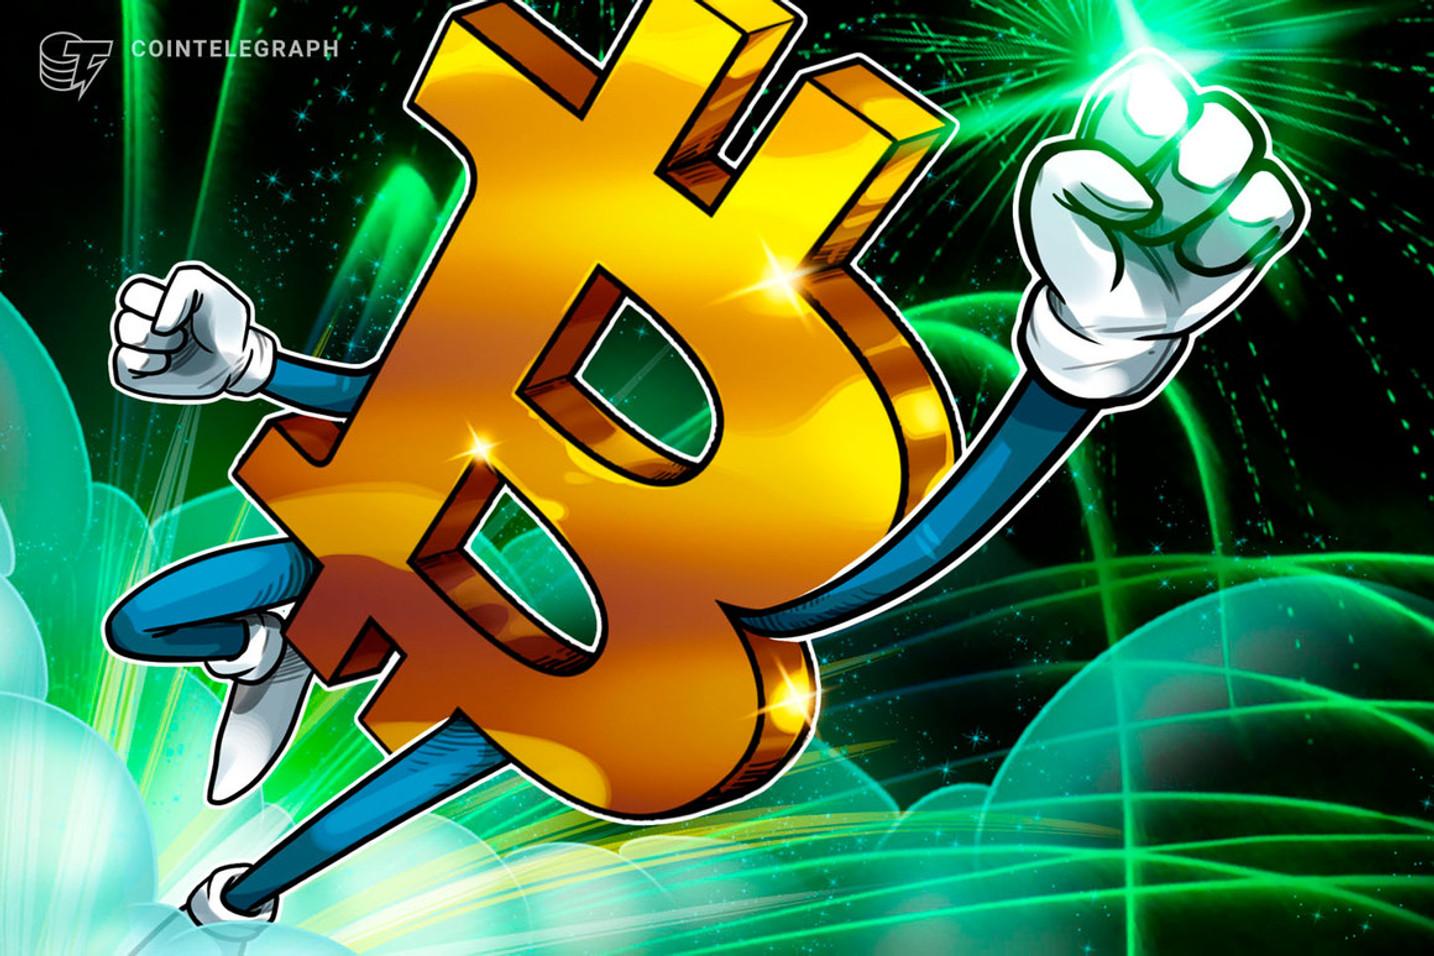 Bitcoin fiyatında yeni rekor: 400 bin TL görüldü!